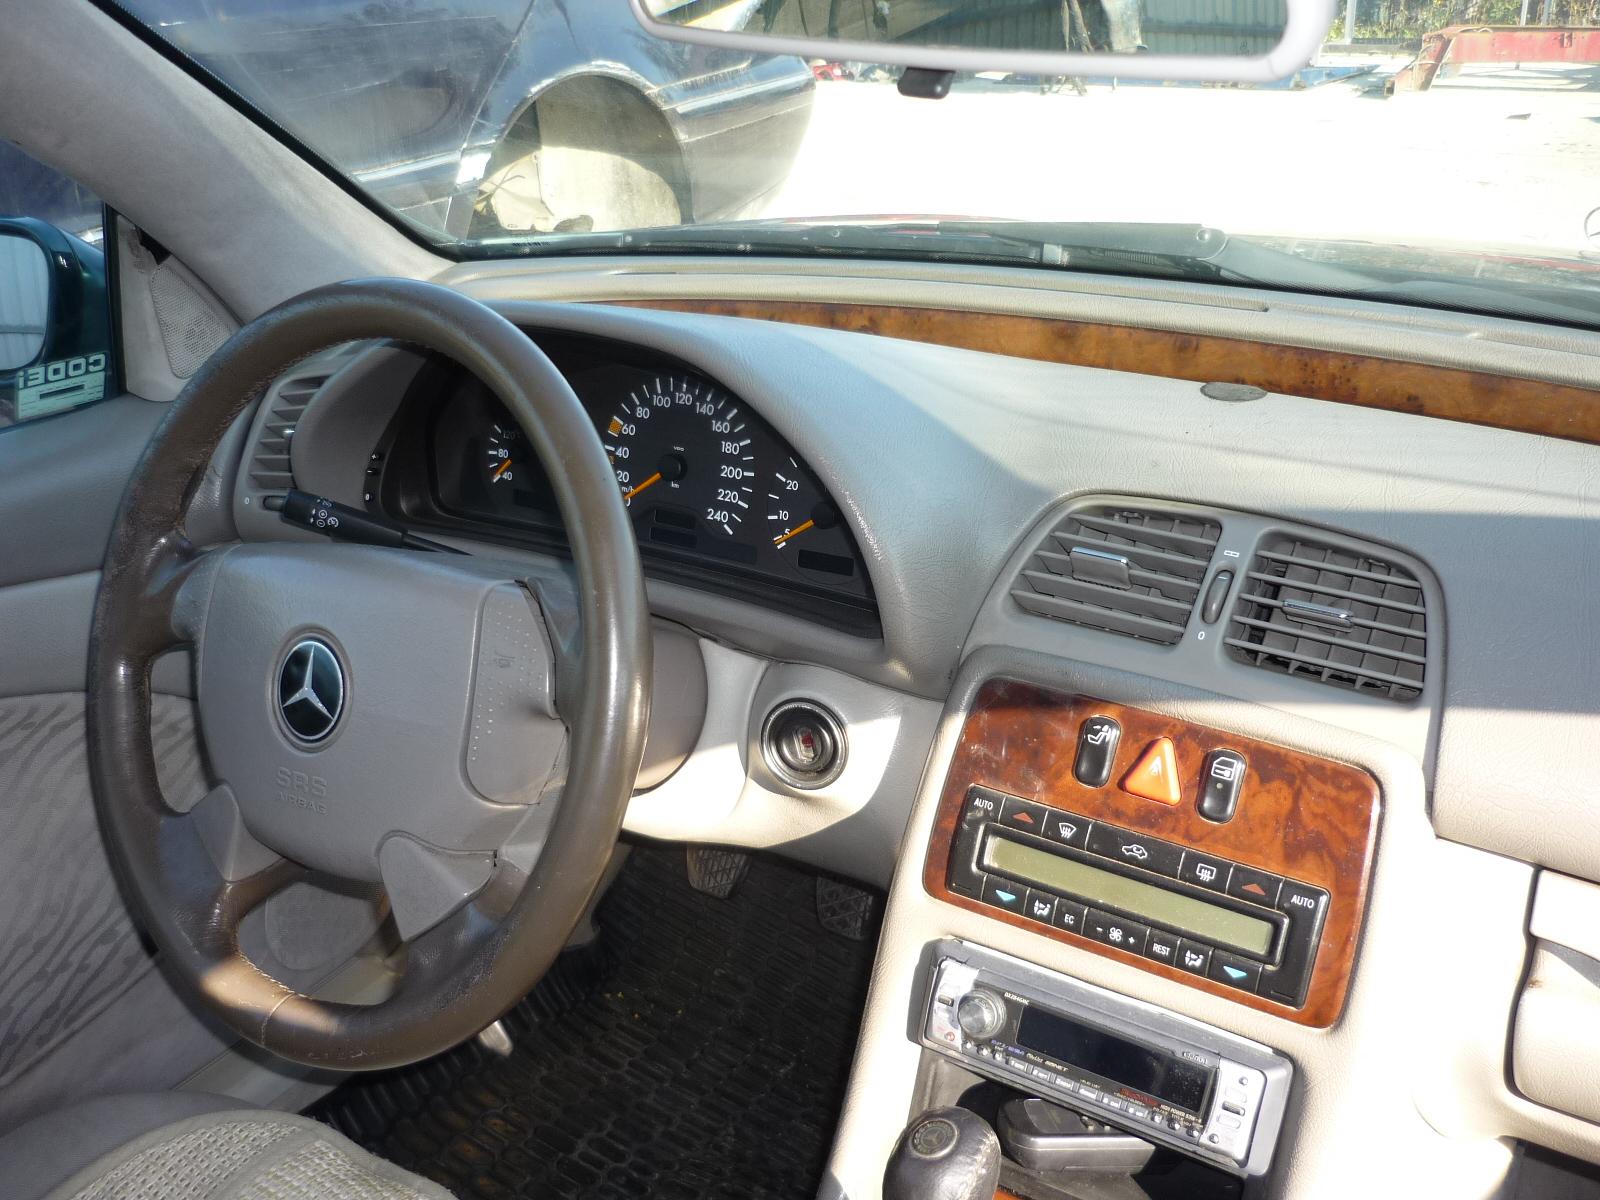 Motor cu anexe si alte piese din dezmembrari Mercedes CLK - 19 Octombrie 2011 - Poza 2